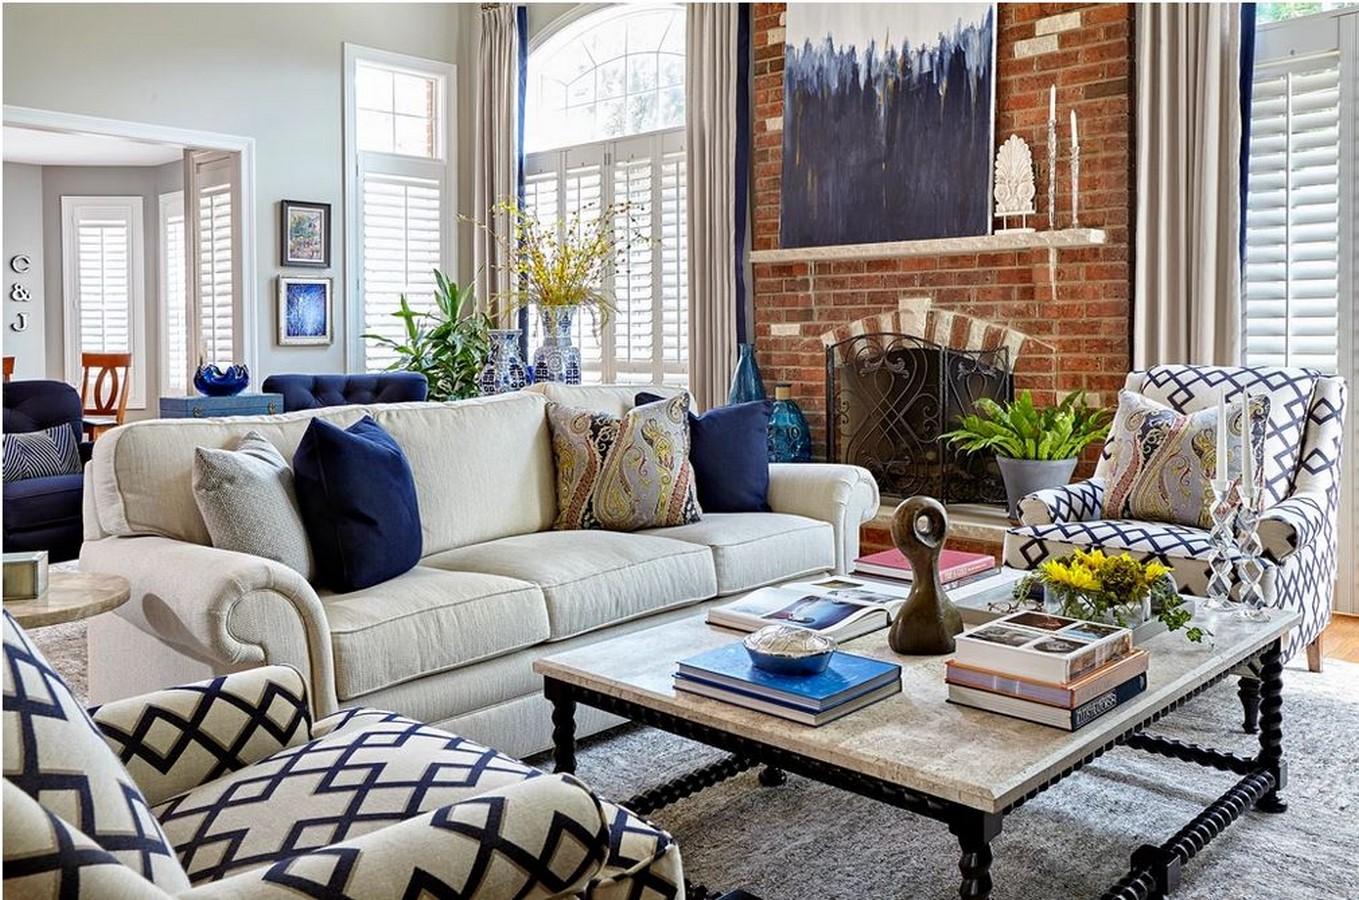 Tiffany Brooks Interiors- 15 Iconic Projects - Sheet6